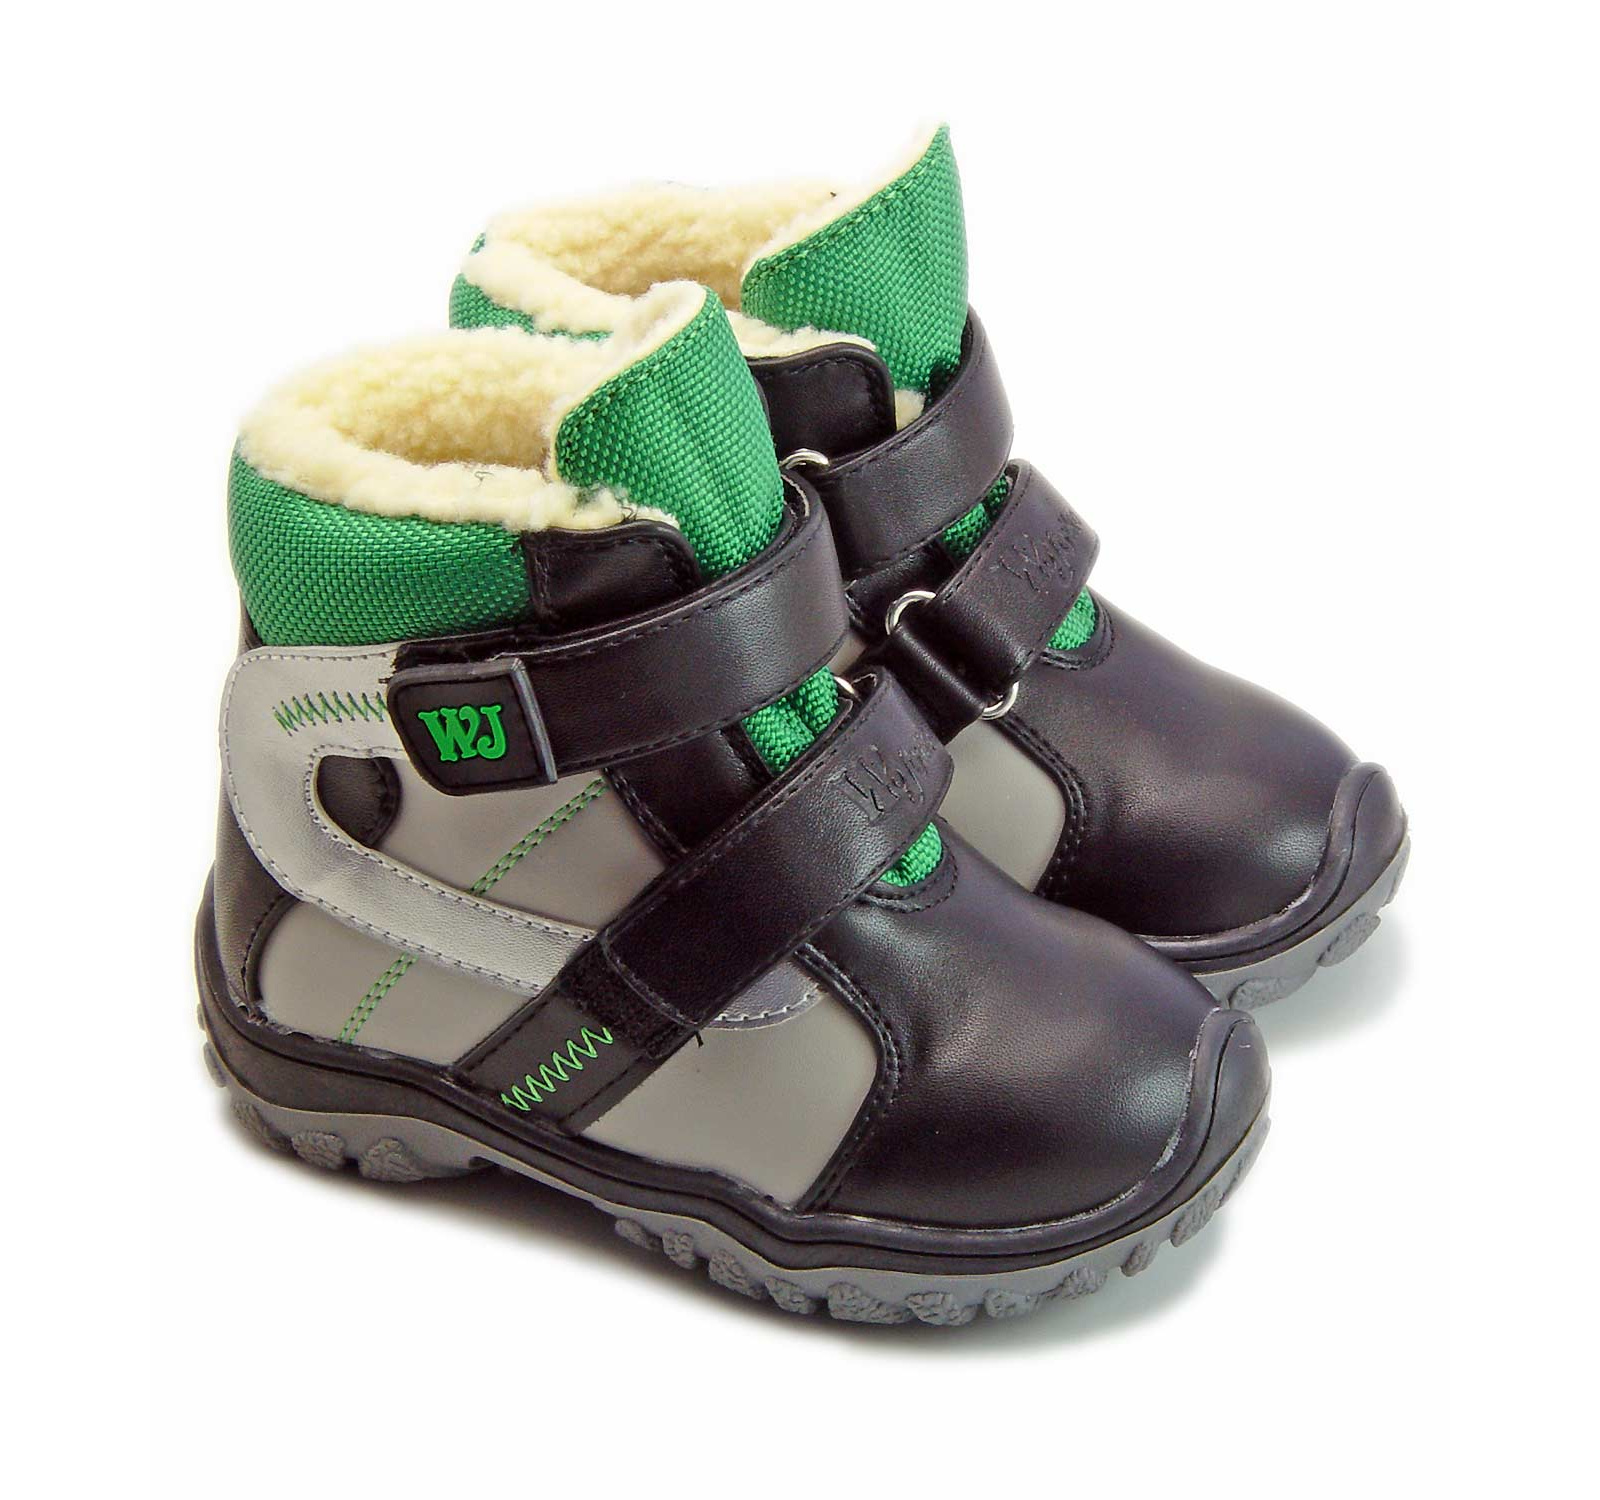 Wojtylko® Ghete piele eco imblanite gri-verde 200881